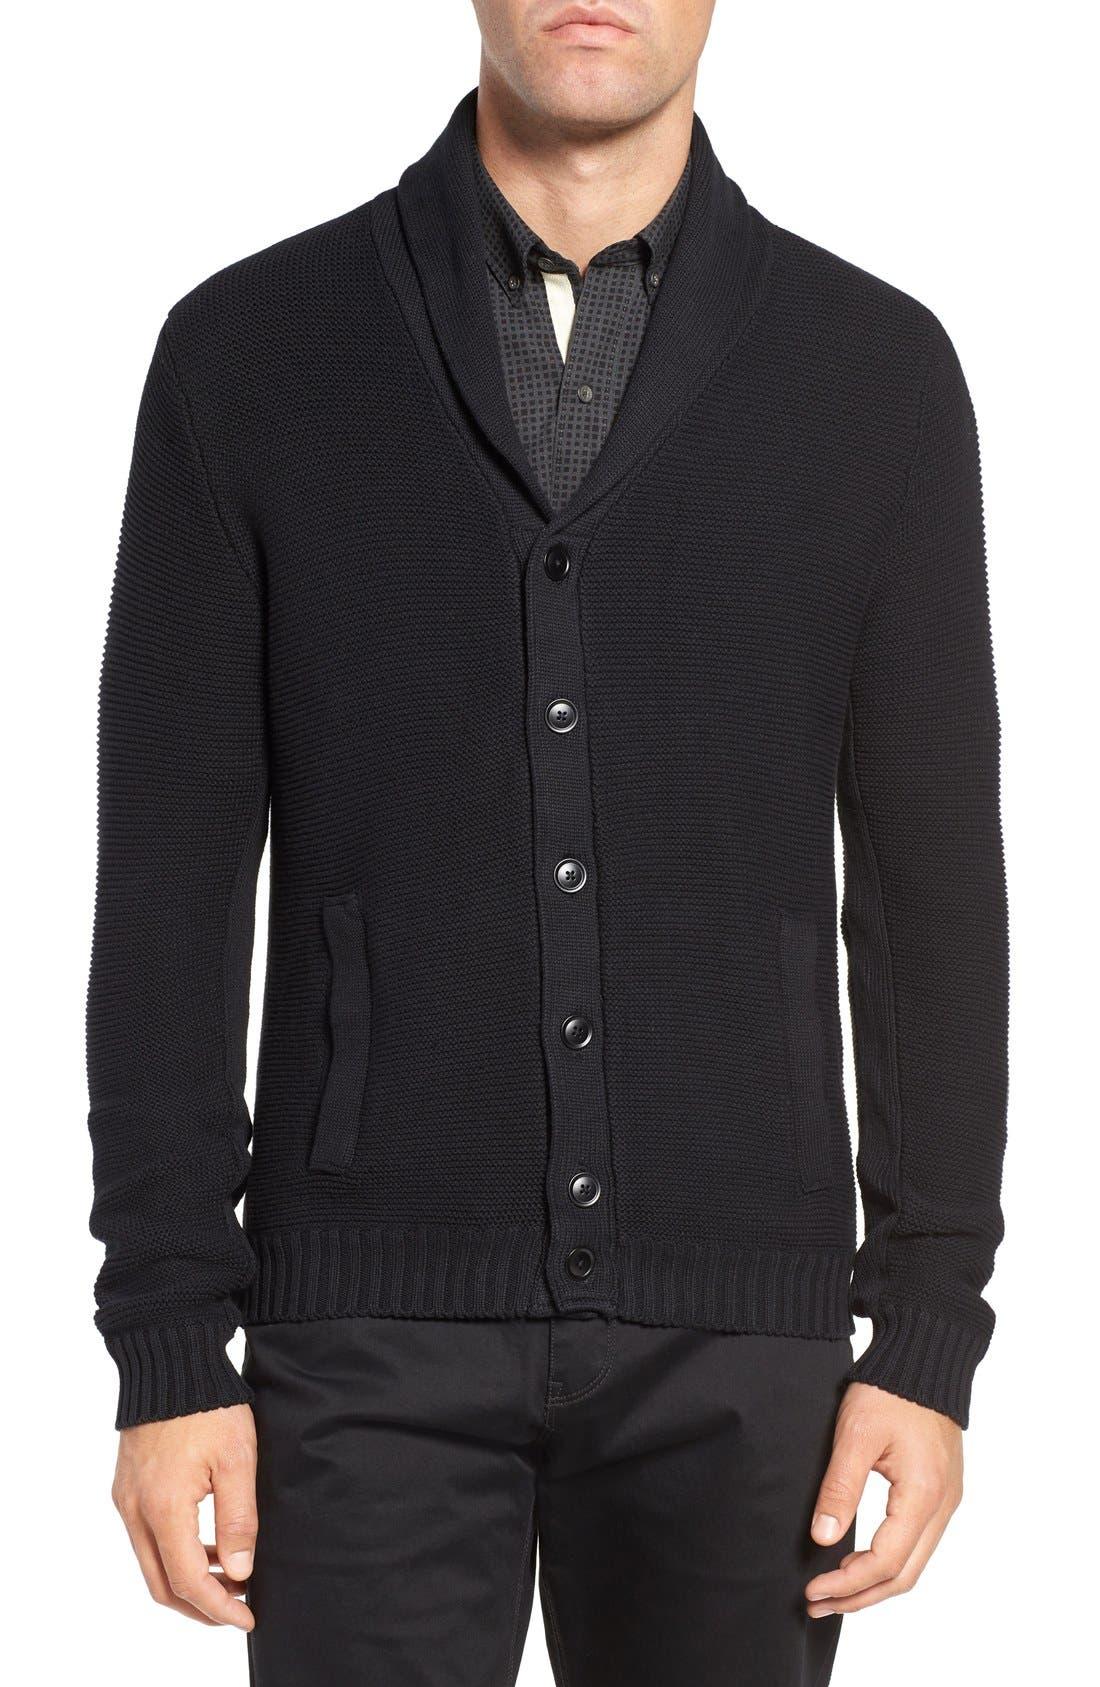 Cypress Cotton Shawl Collar Cardigan,                         Main,                         color, Black